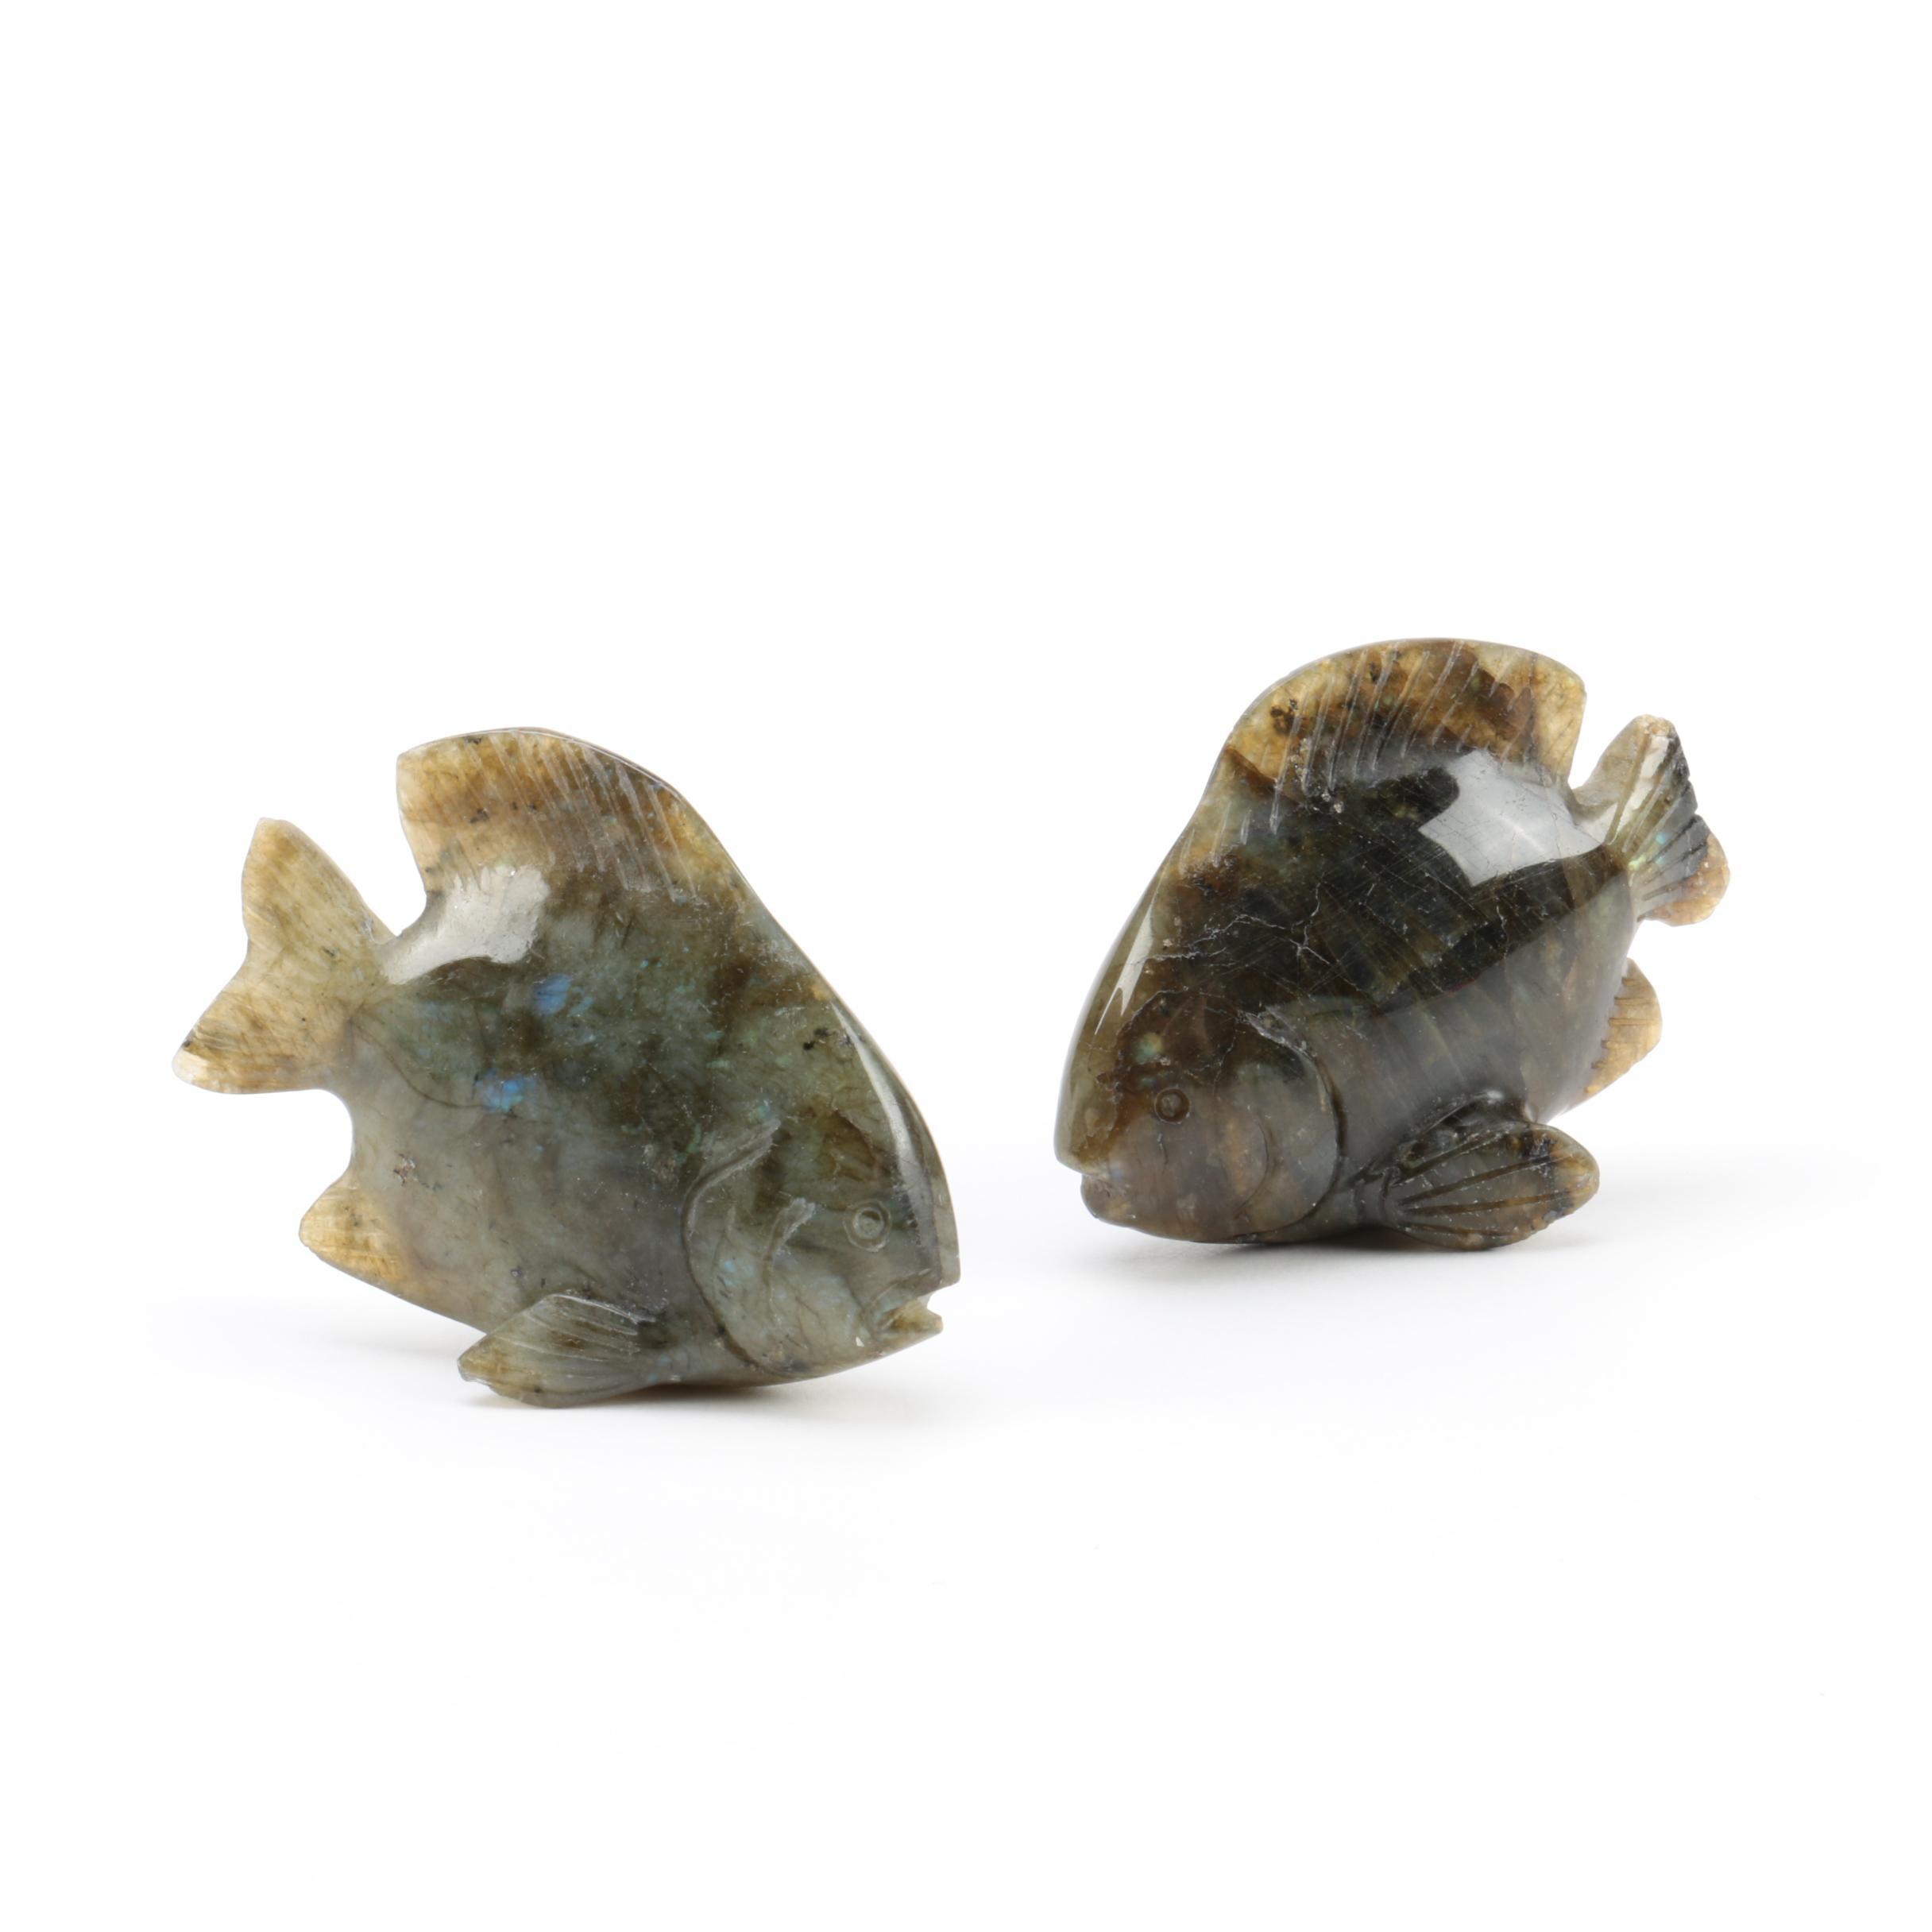 Labradorite Fish Figurines